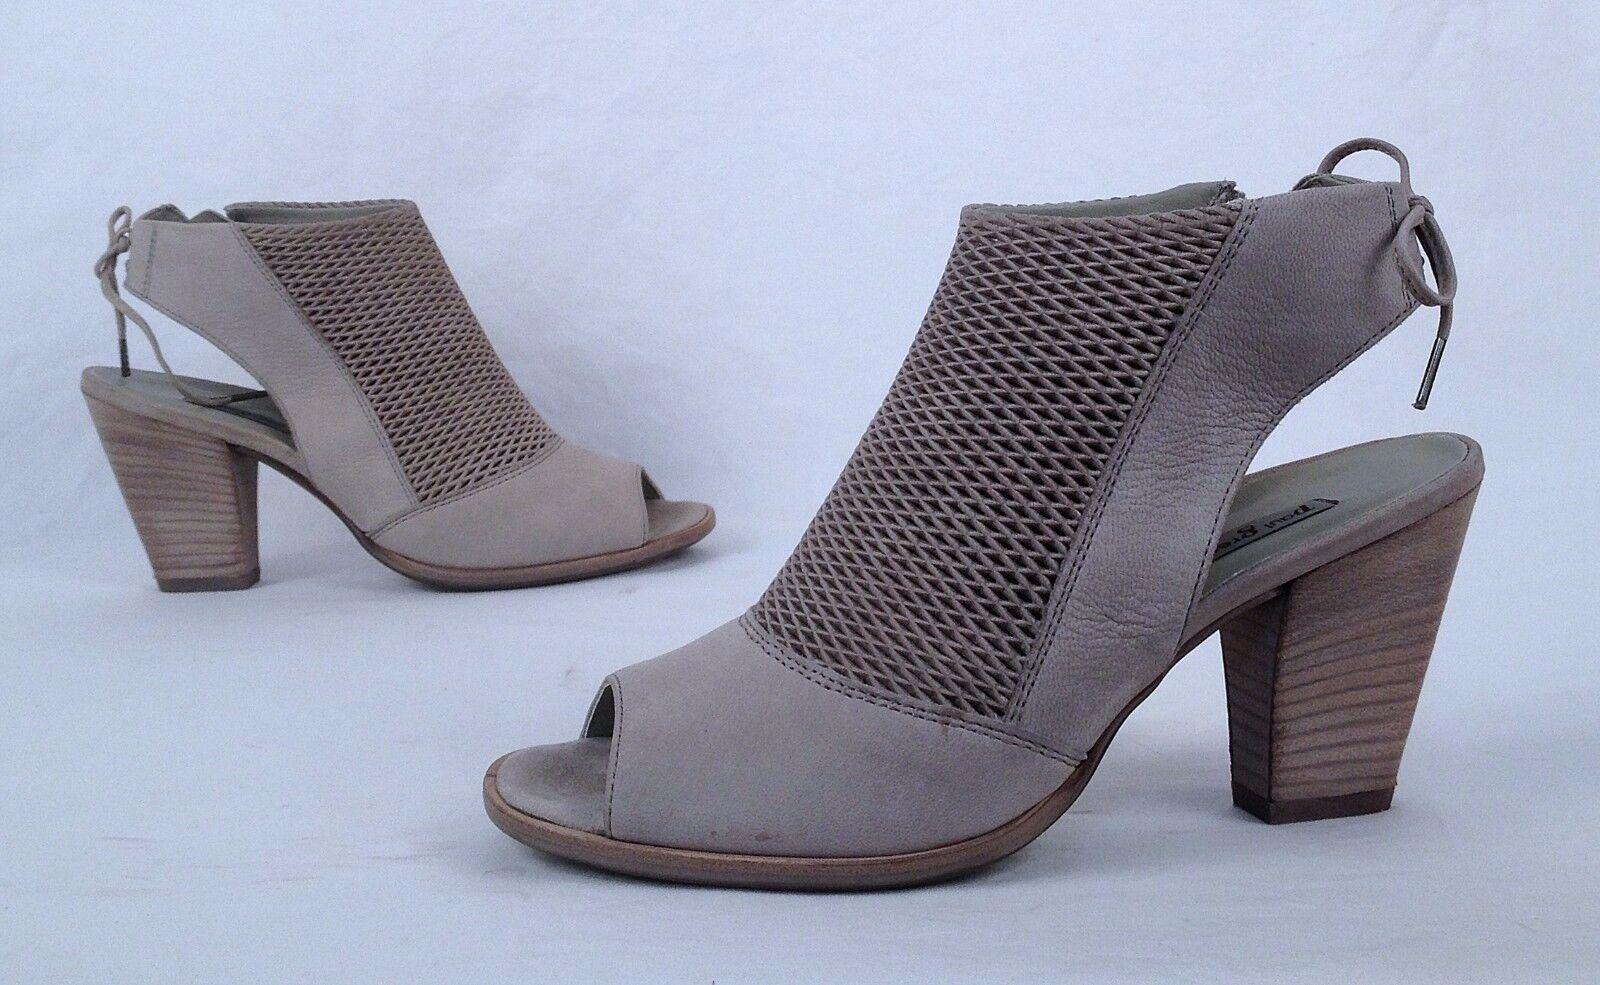 NEW   Paul Grün 'Lexi' Sandal- grau- Größe 6 US  3.5 UK   375  (B19)